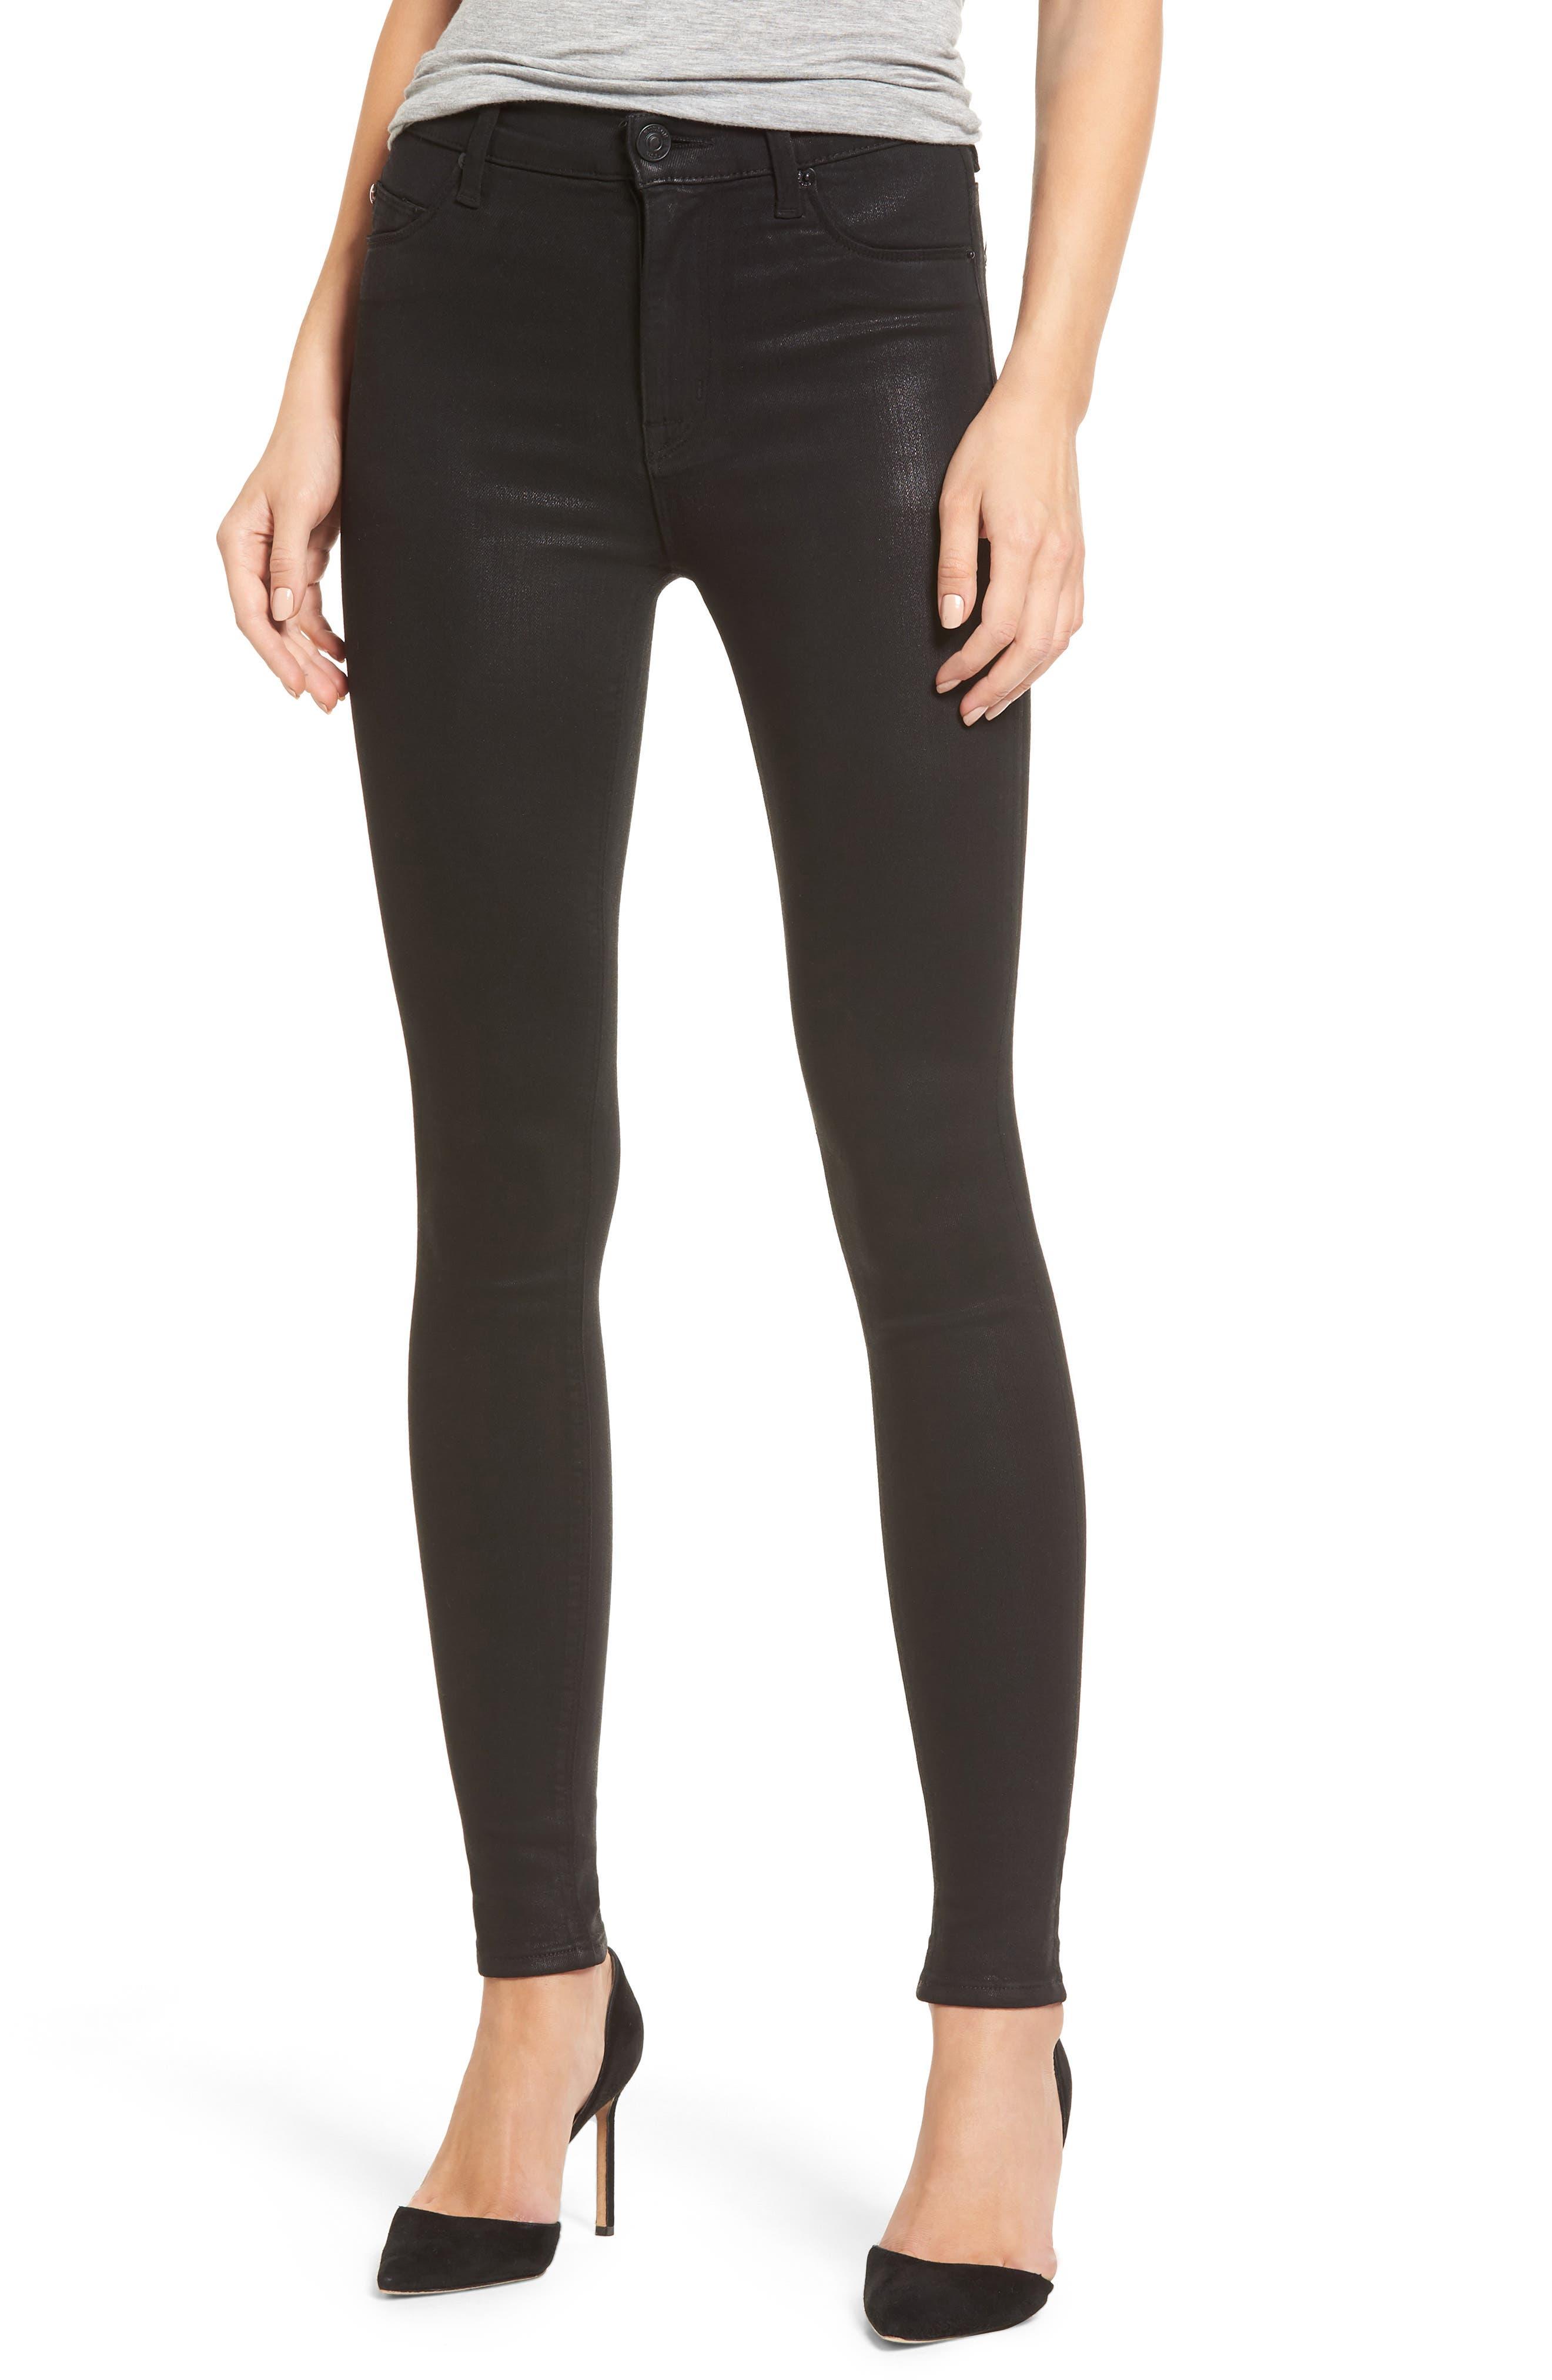 Alternate Image 1 Selected - Hudson Jeans Barbara High Waist Skinny Jeans (Noir Coated)